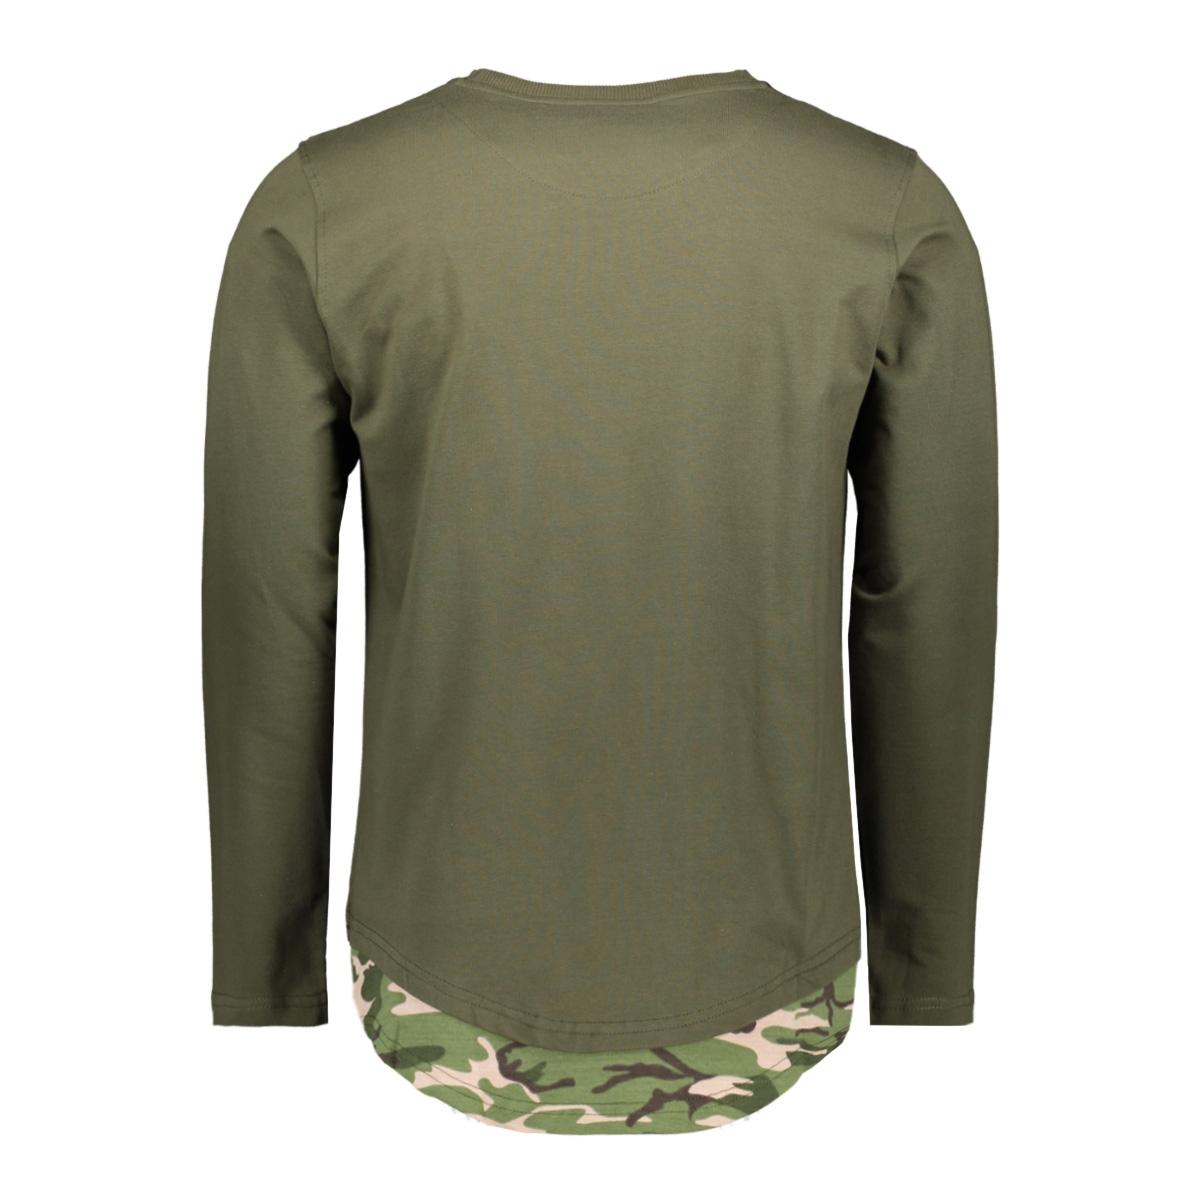 76106 gabbiano sweater army